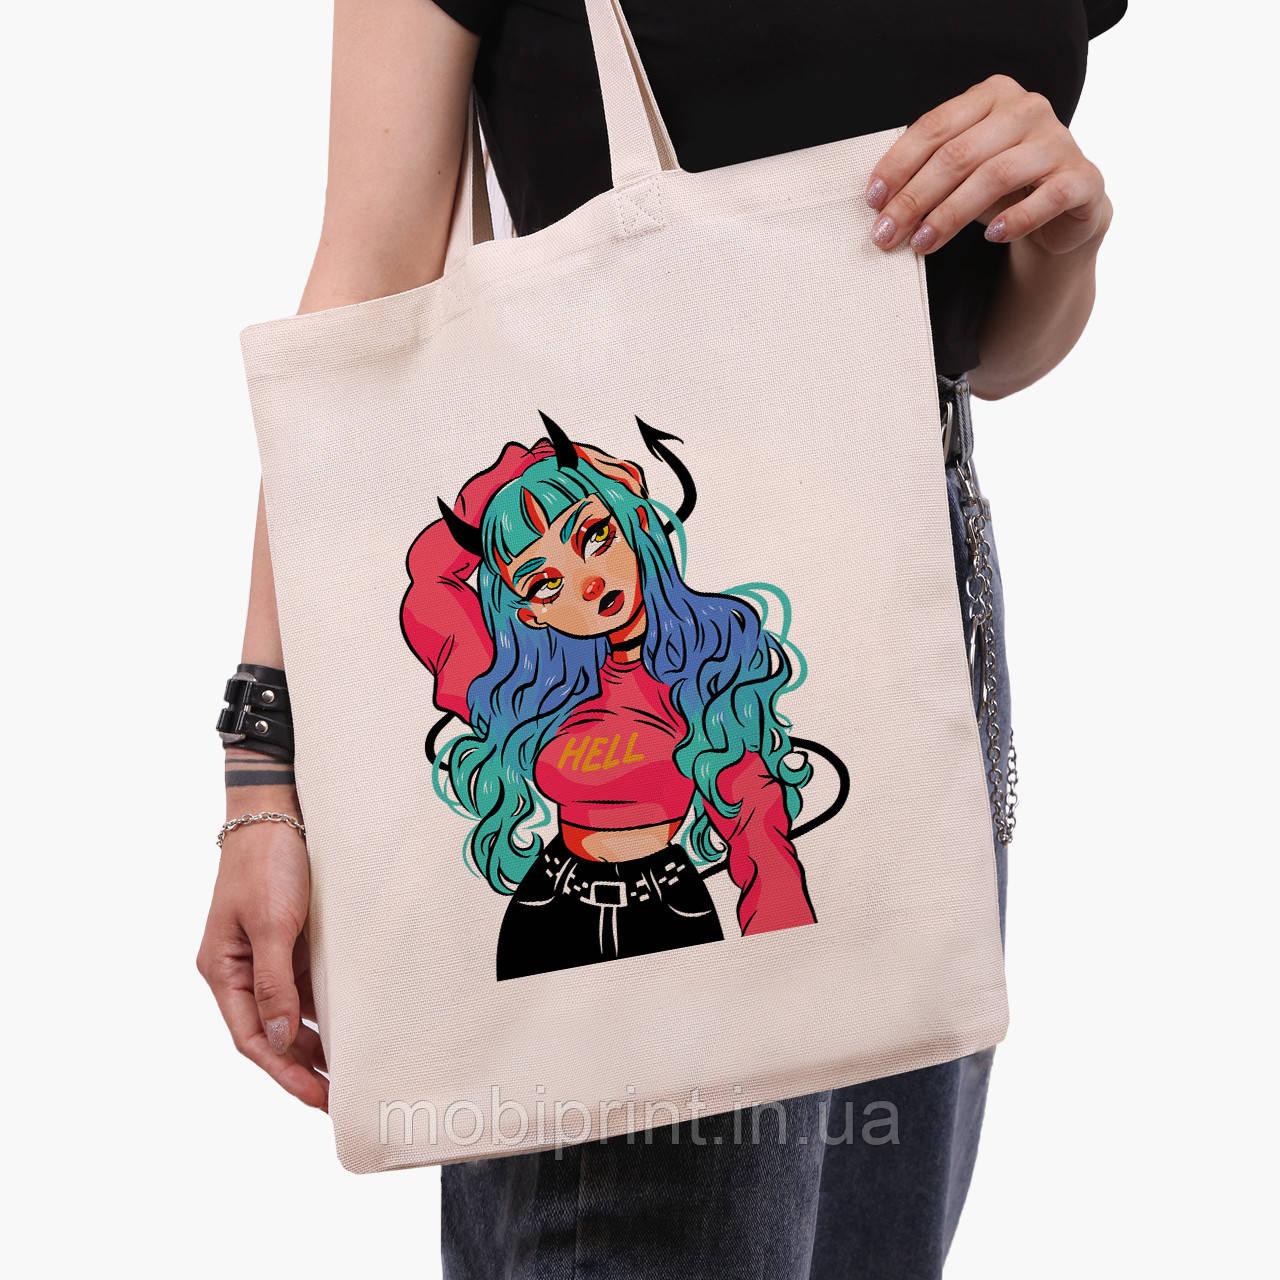 Еко сумка шоппер Дівчина демон (Cute Girl Illustration Art) (9227-2838) 41*35 см